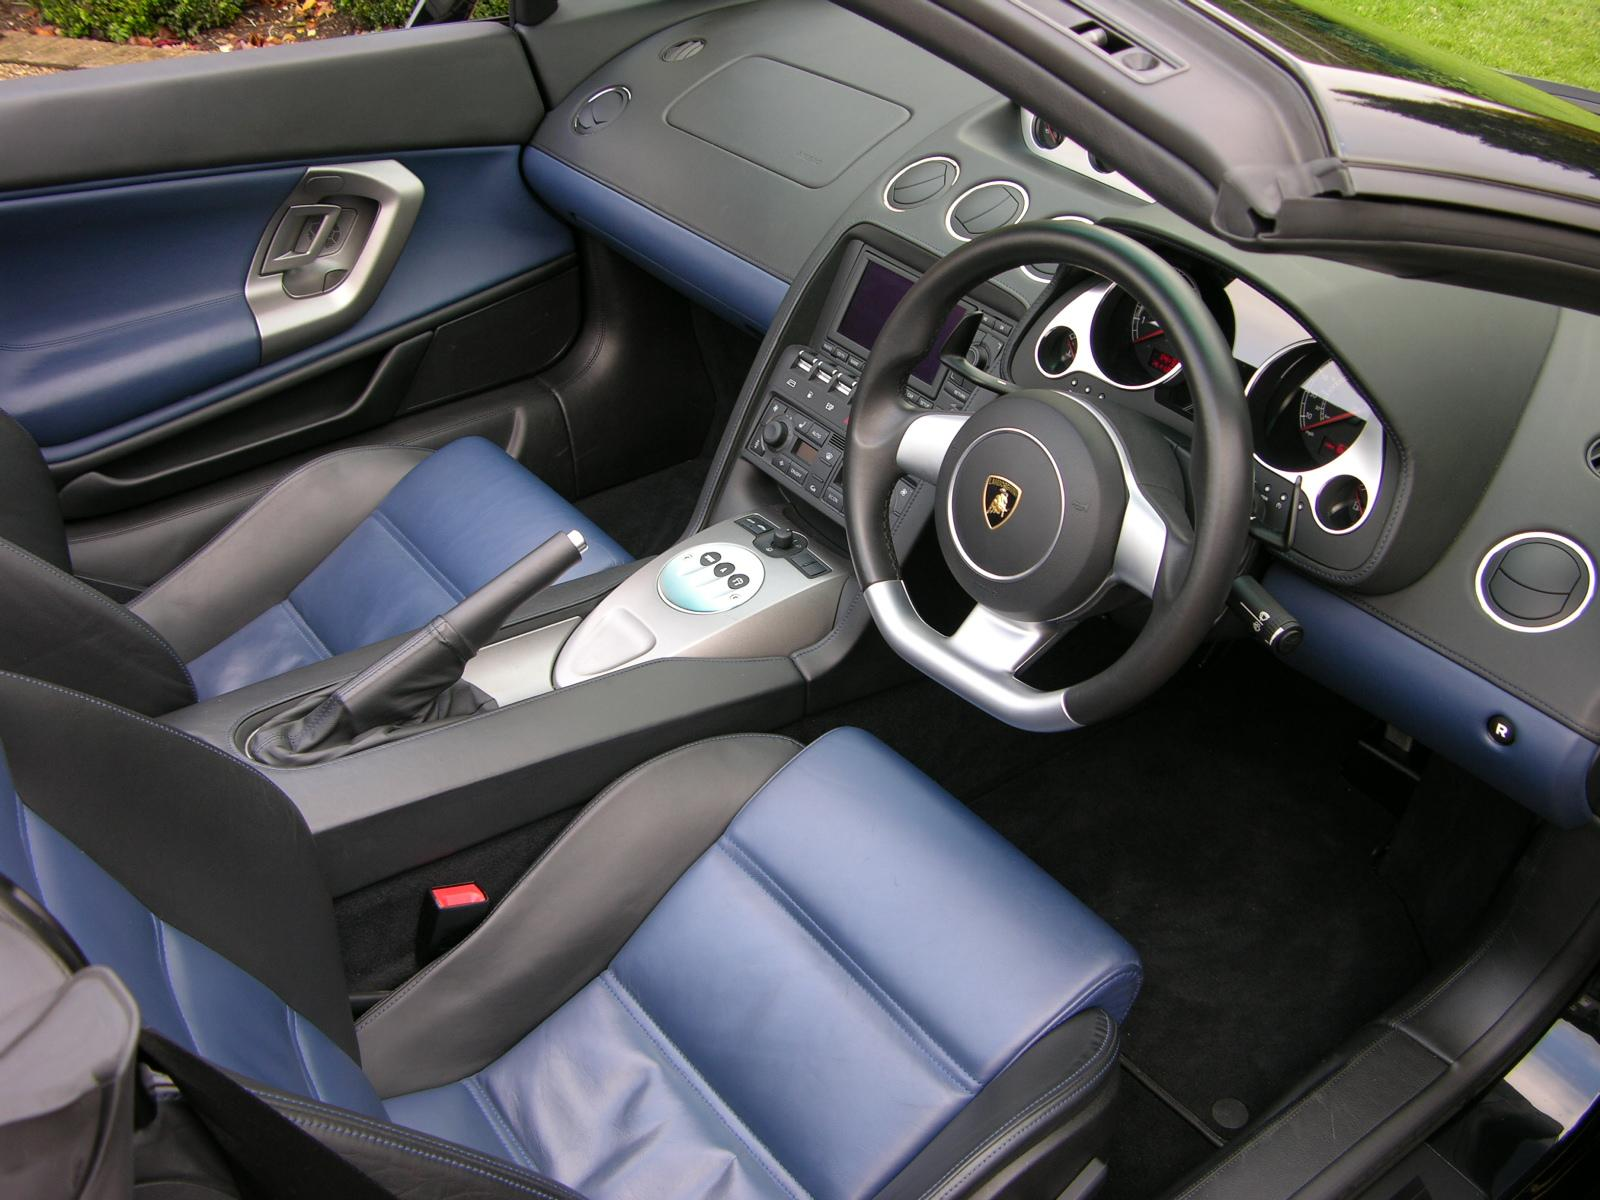 File:Lamborghini Gallardo Spyder E-Gear - Flickr - The Car Spy (12).jpg - Wikimedia Commons